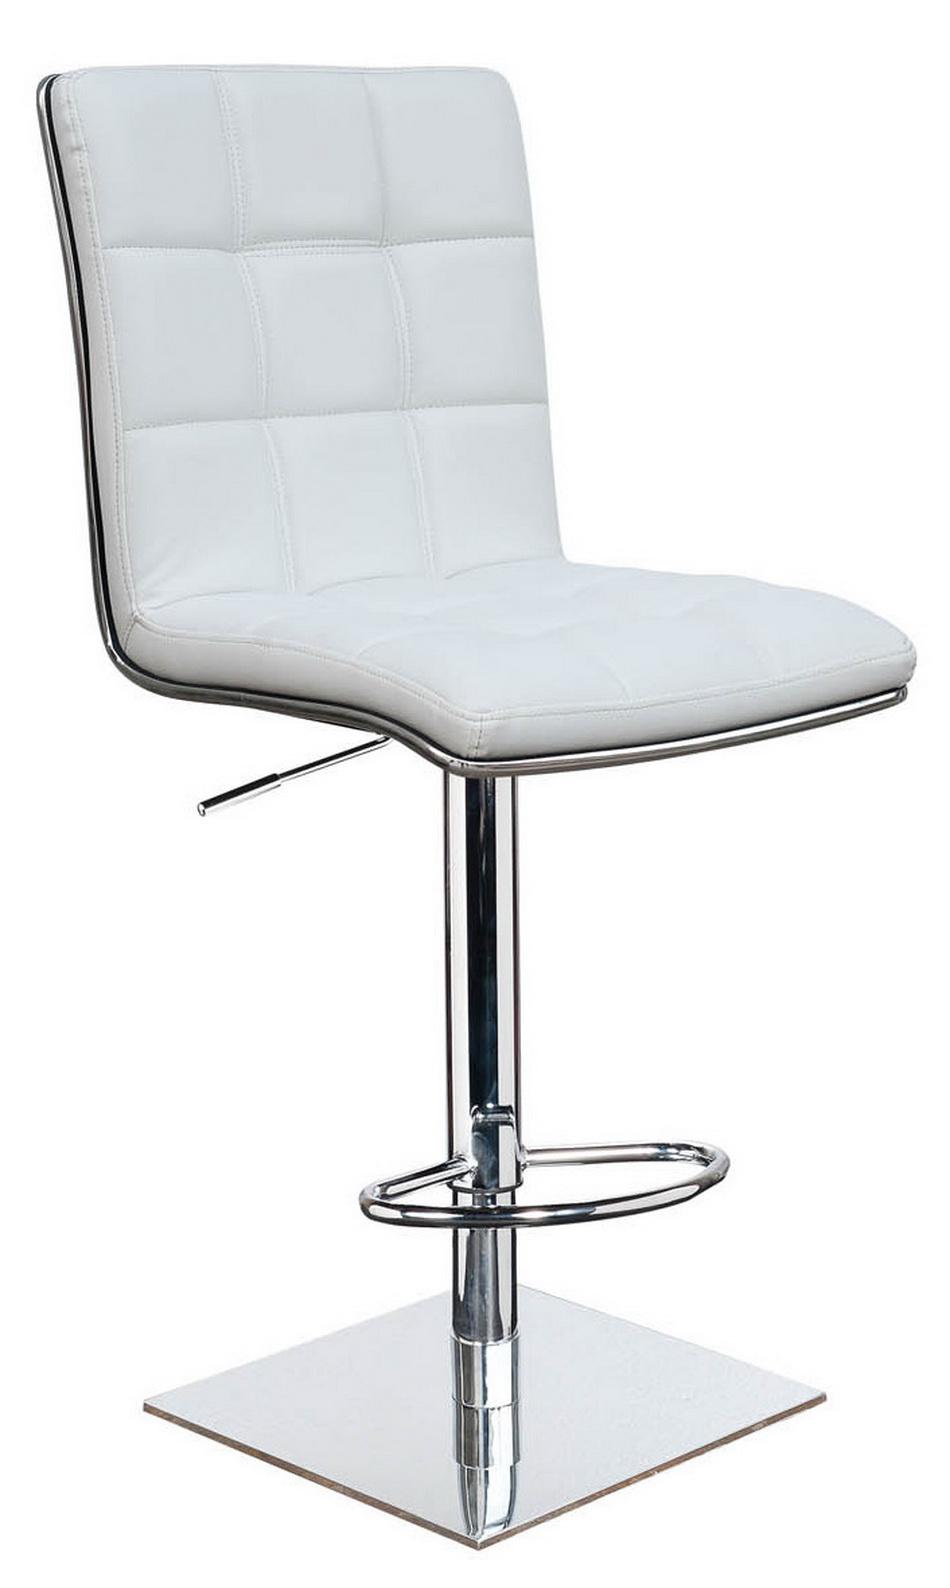 virtuemart_product_bq-bs3021-wh-stool